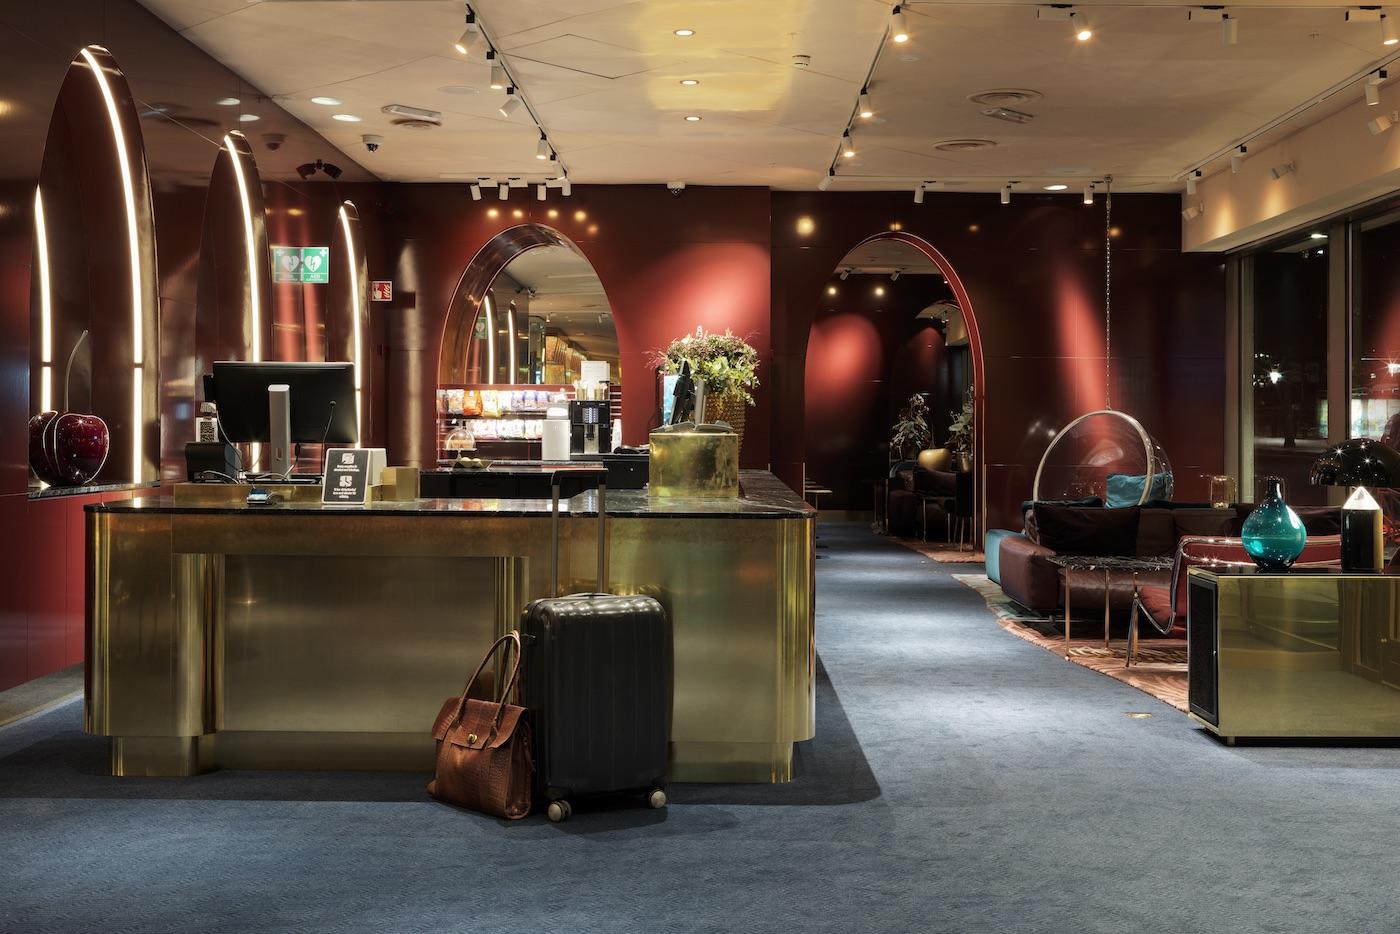 Interior photographs of Scandic Hotels